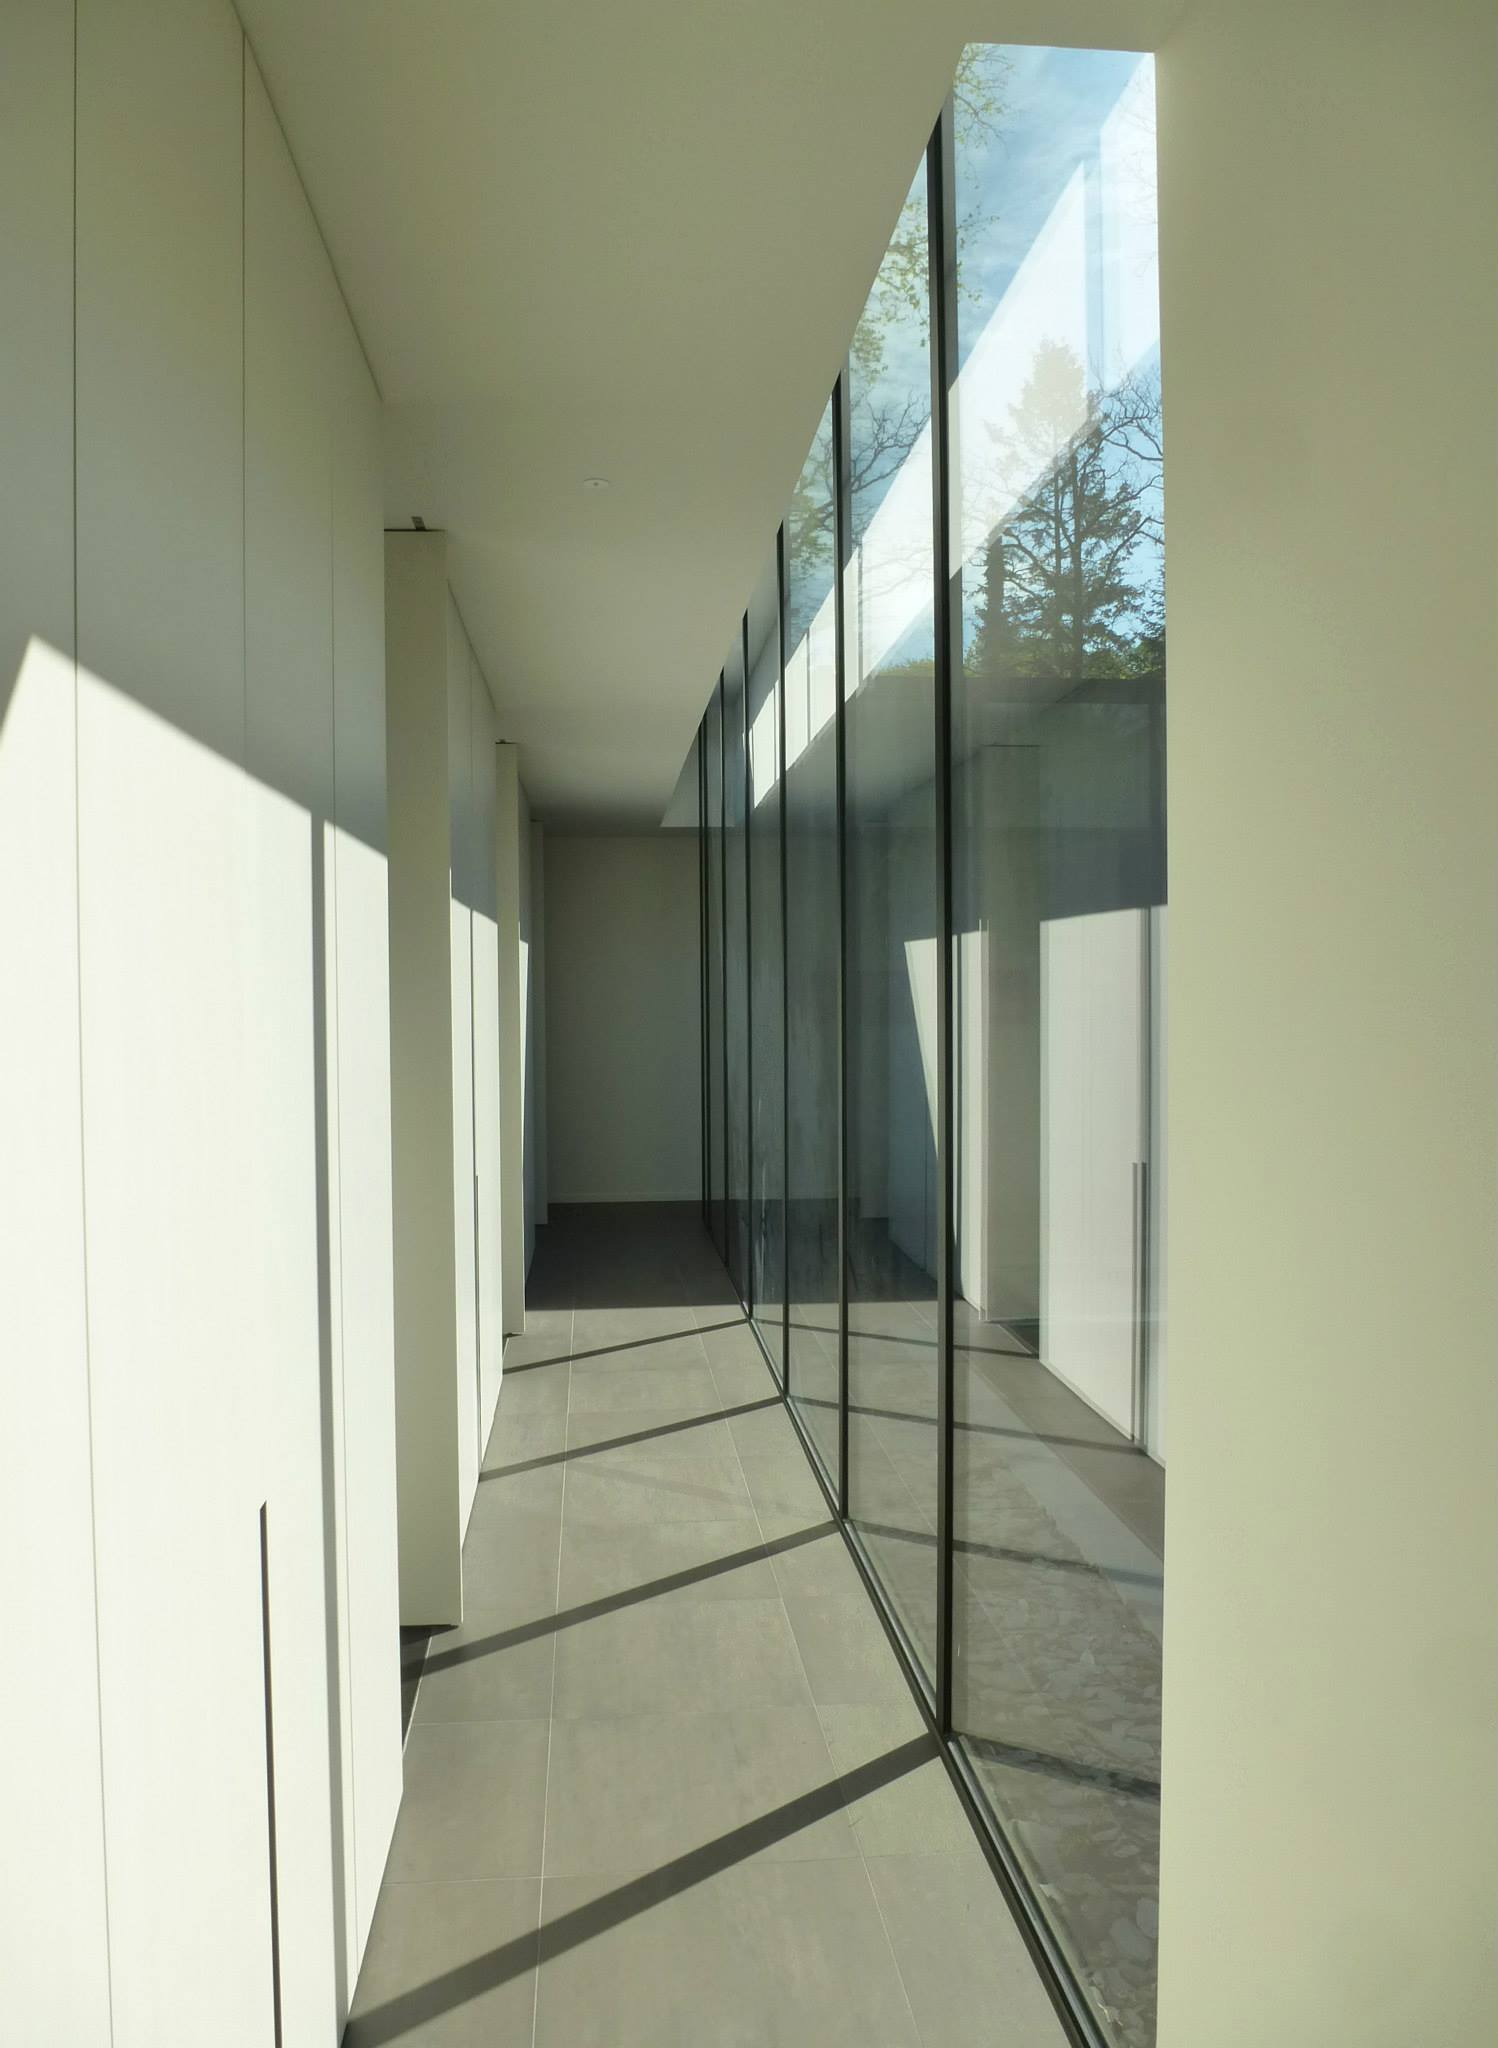 10257139 628031310608080 8512740892128421922 o | Baeyens & Beck architecten Gent | architect nieuwbouw renovatie interieur | high end | architectenbureau